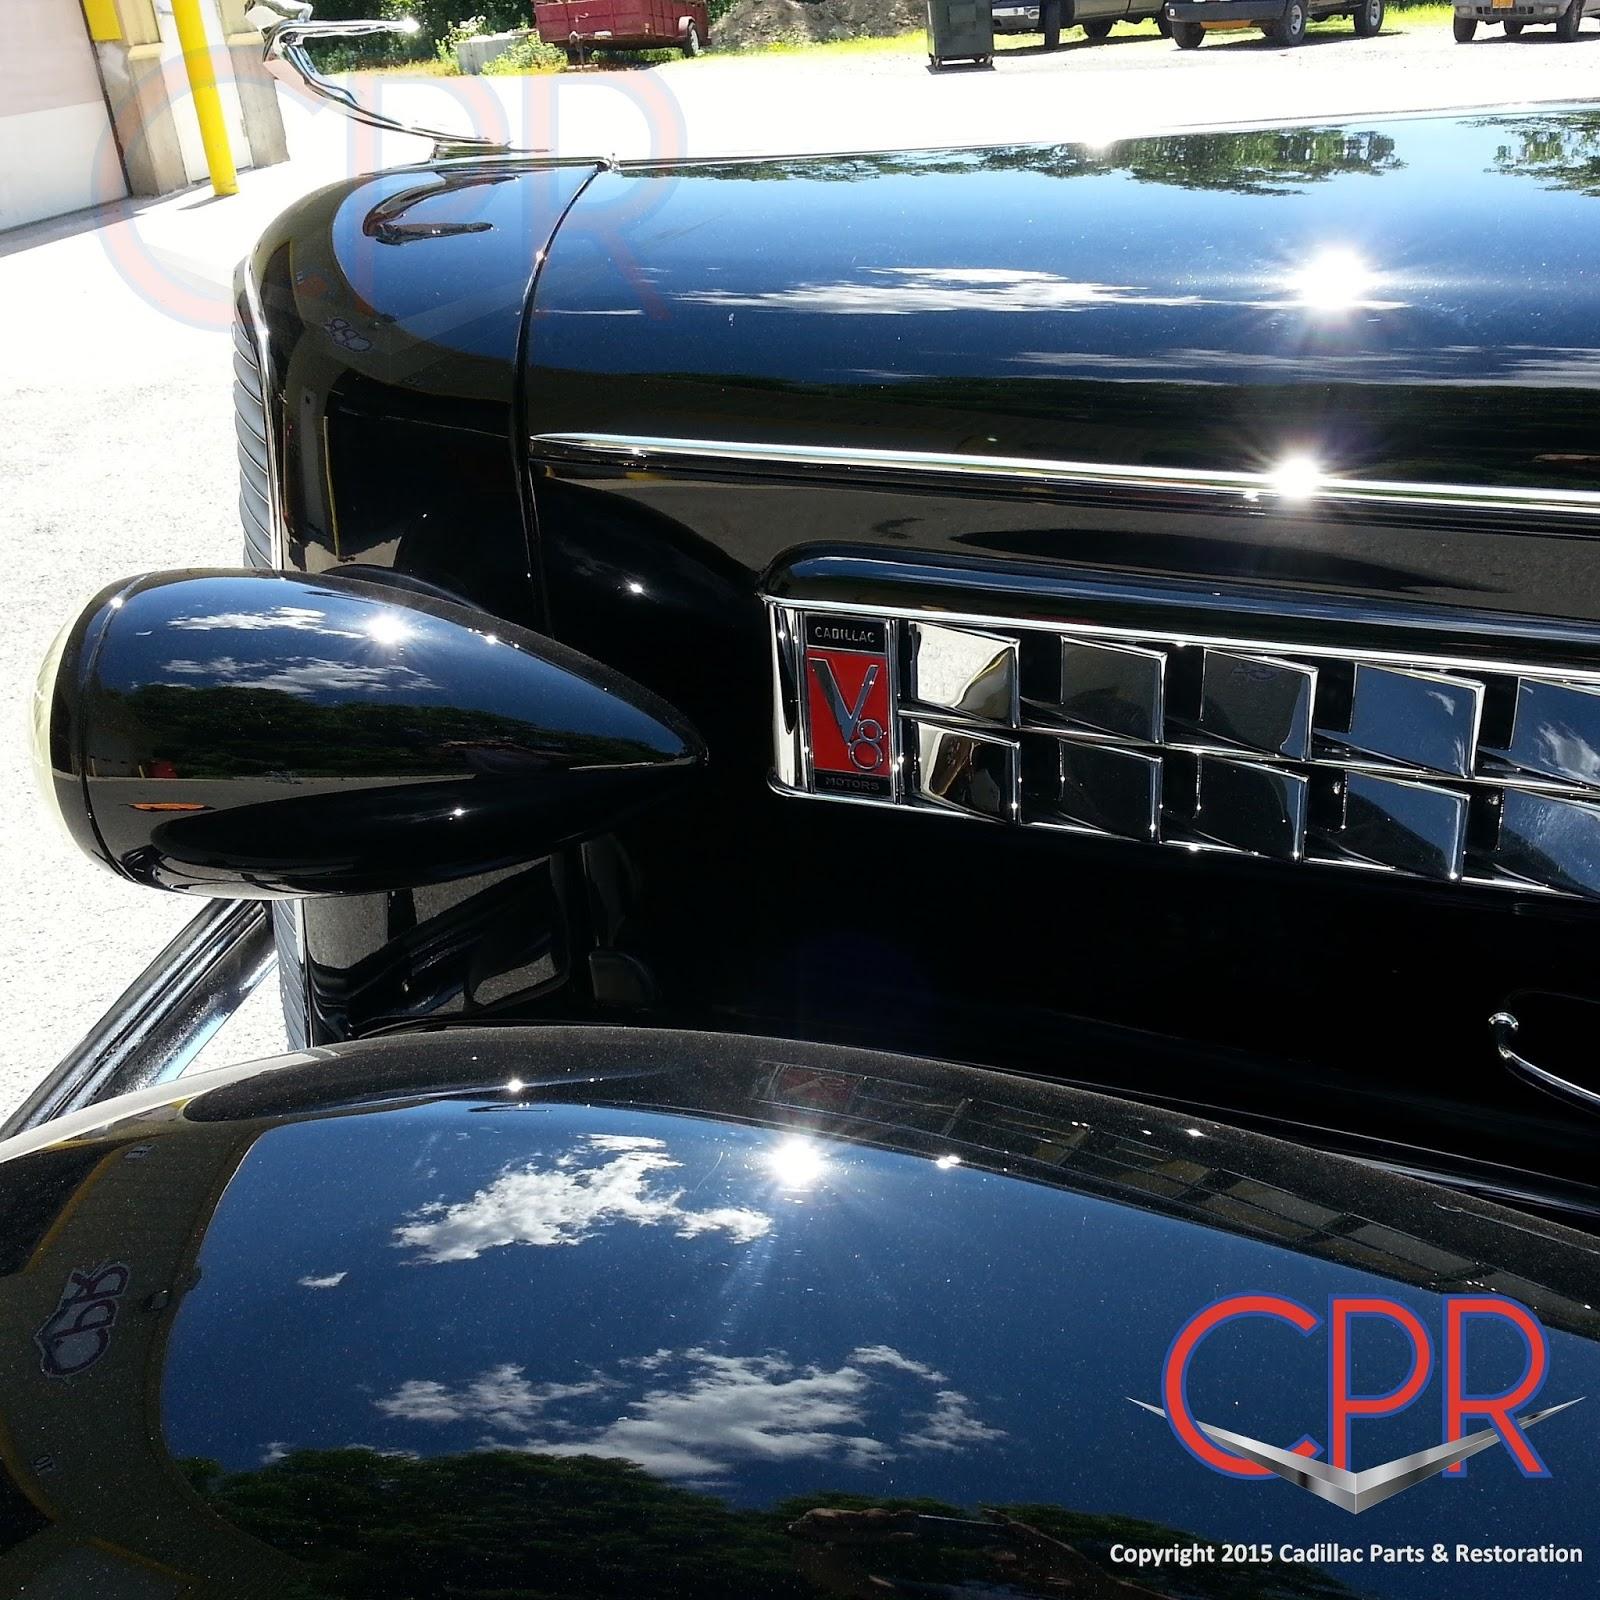 Cadillac Parts & Restoration: 2017